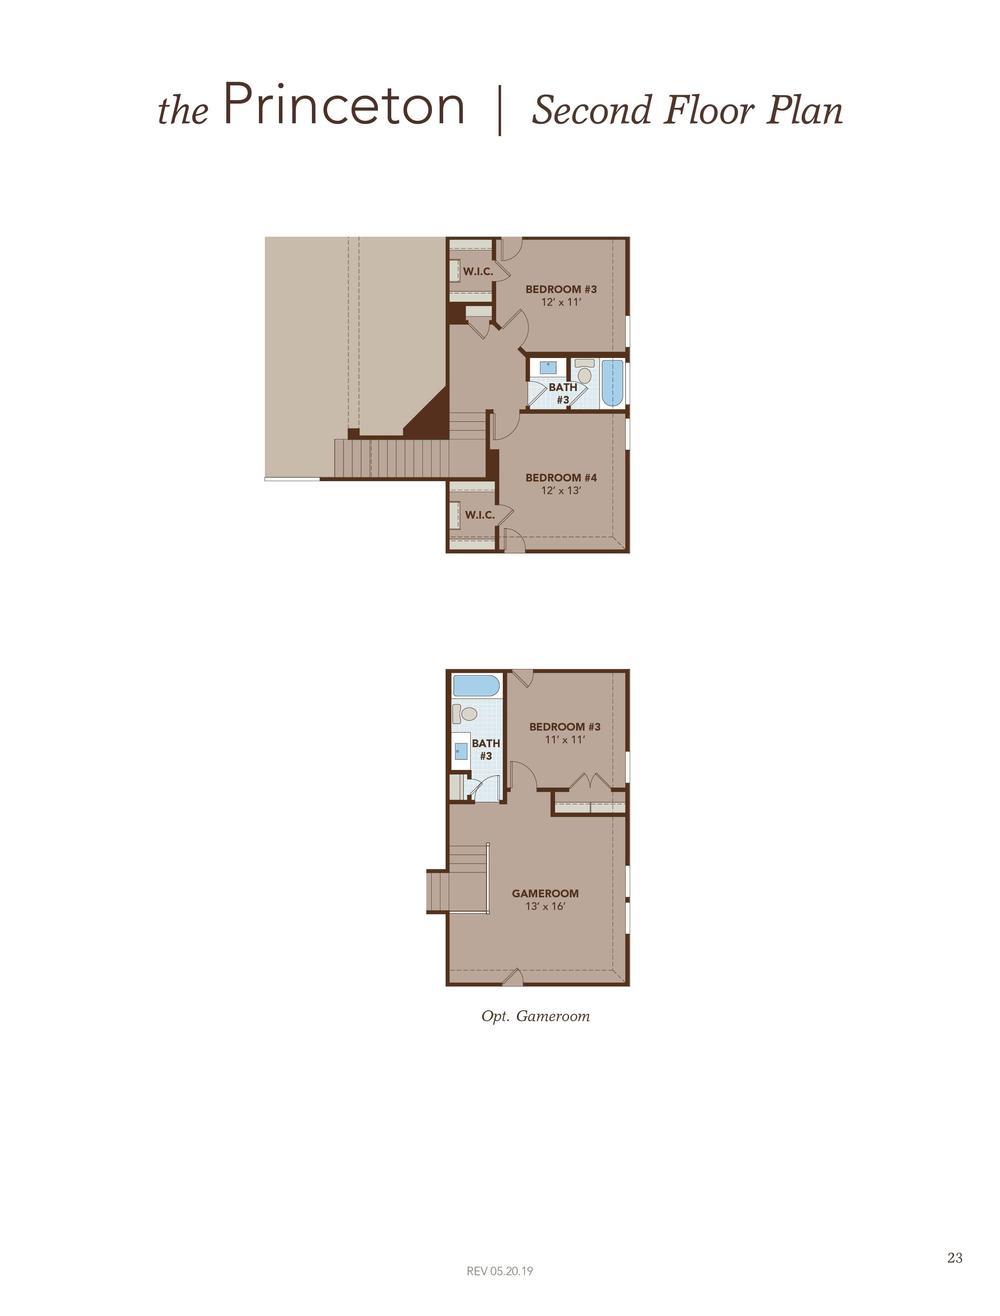 Princeton Second Floor Plan